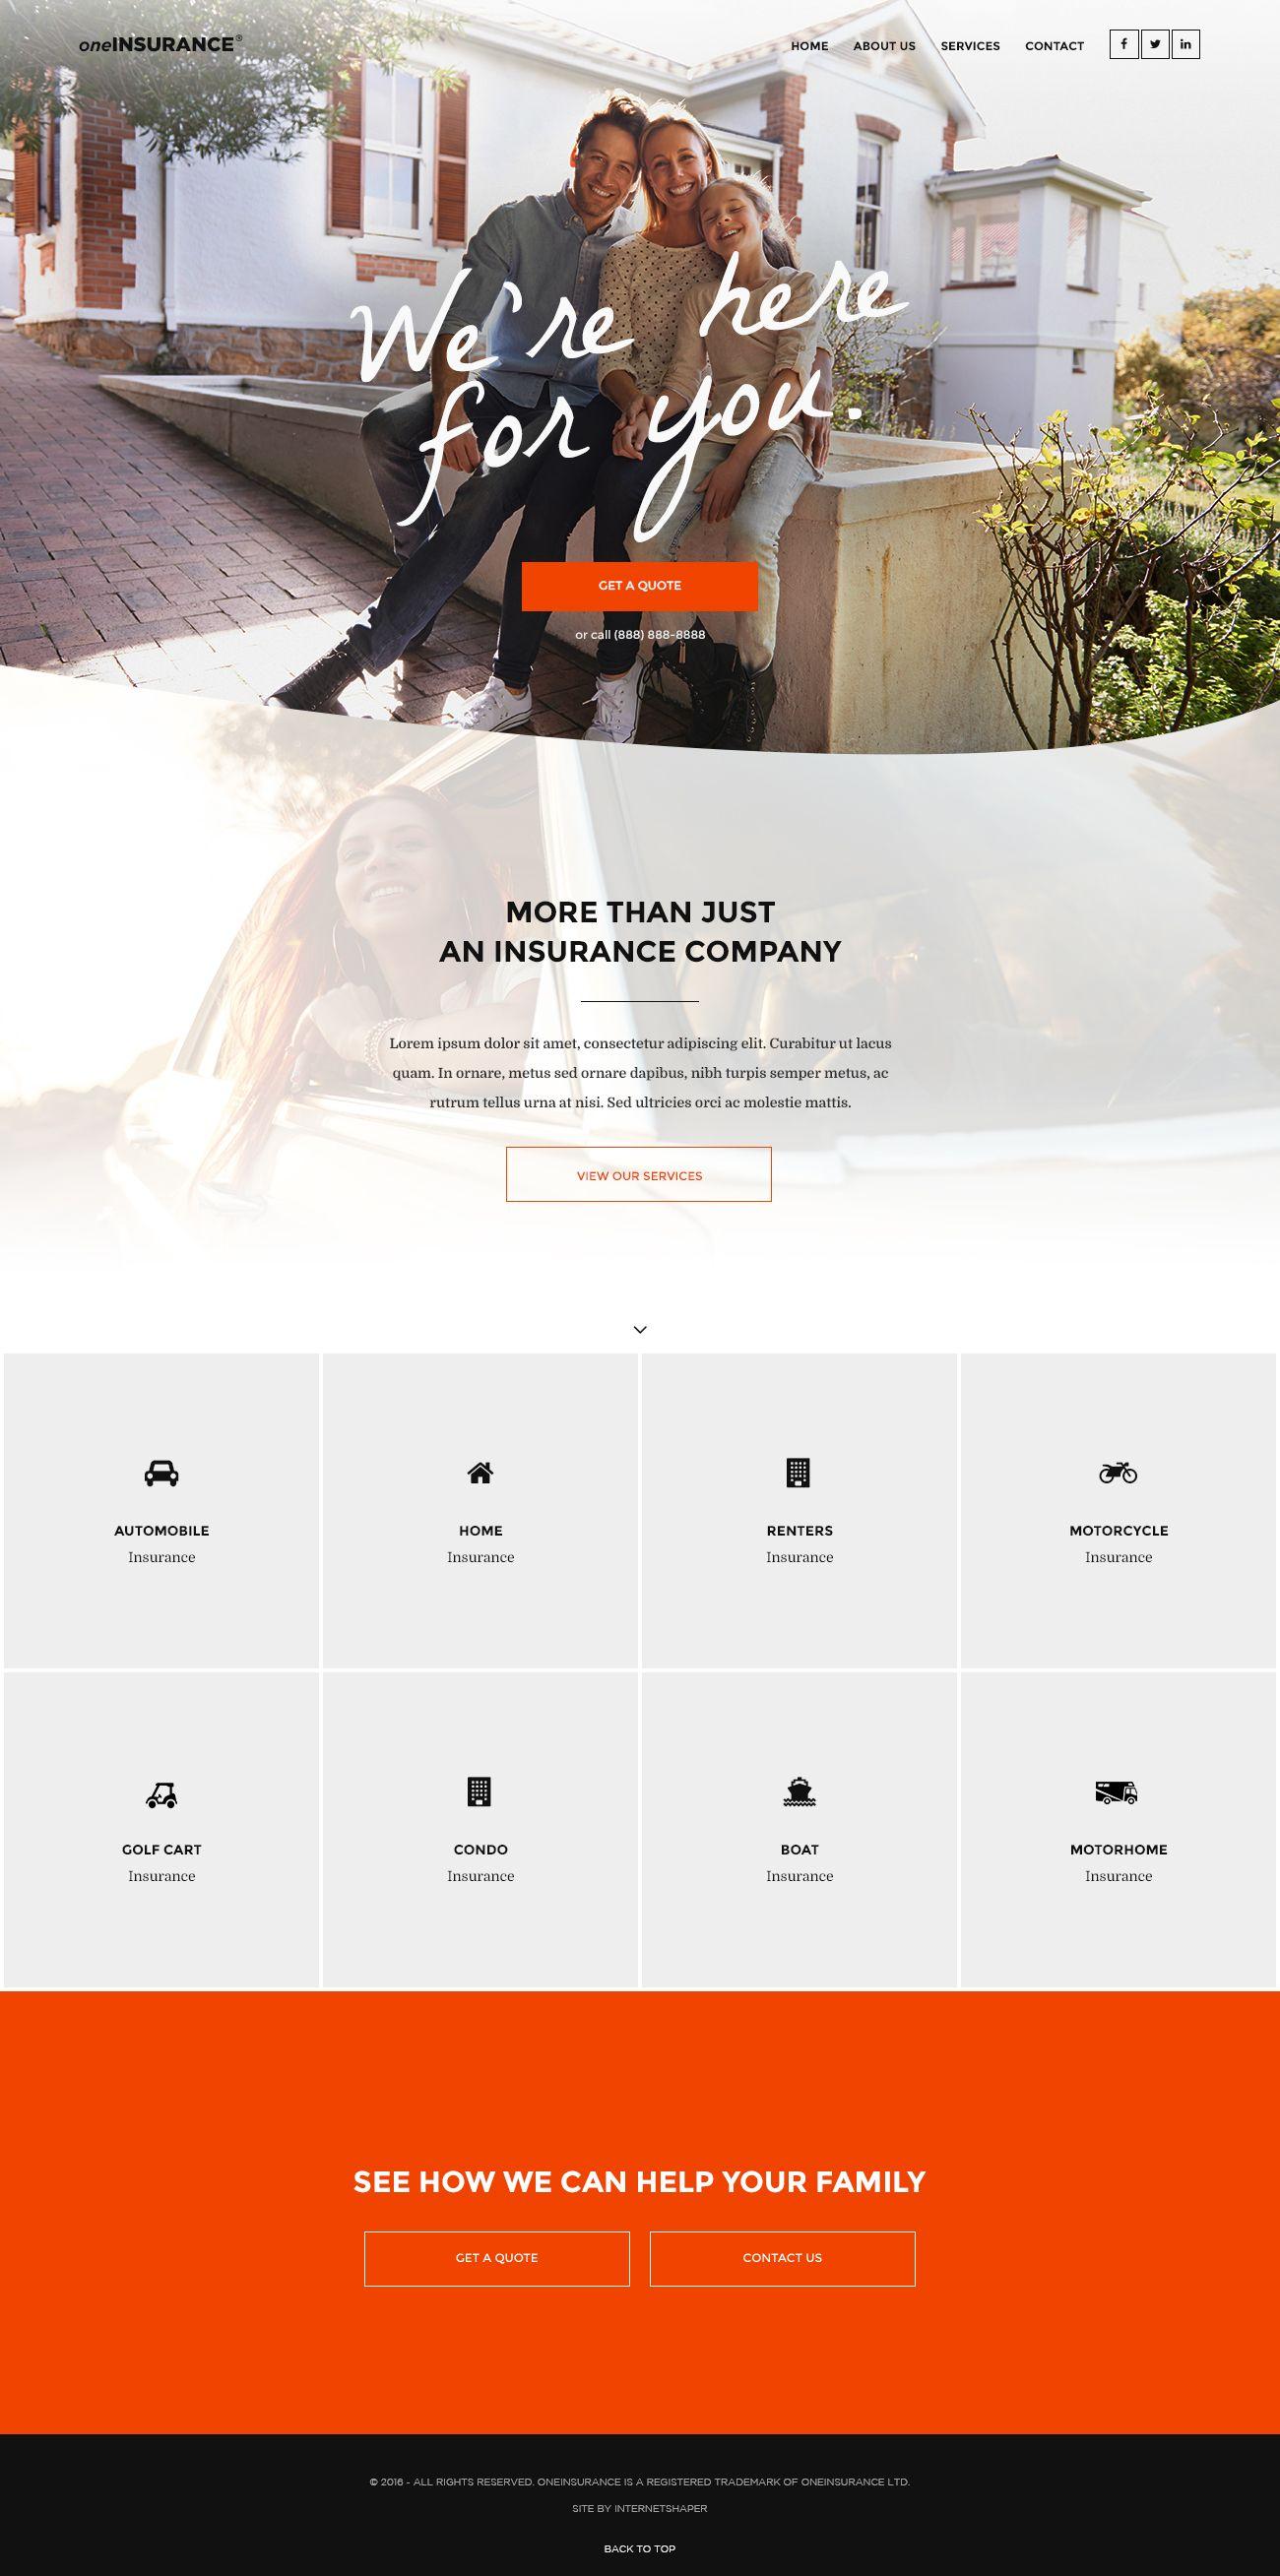 Bootstrap template 1170px 01202016 | Web Inspiration | Pinterest ...